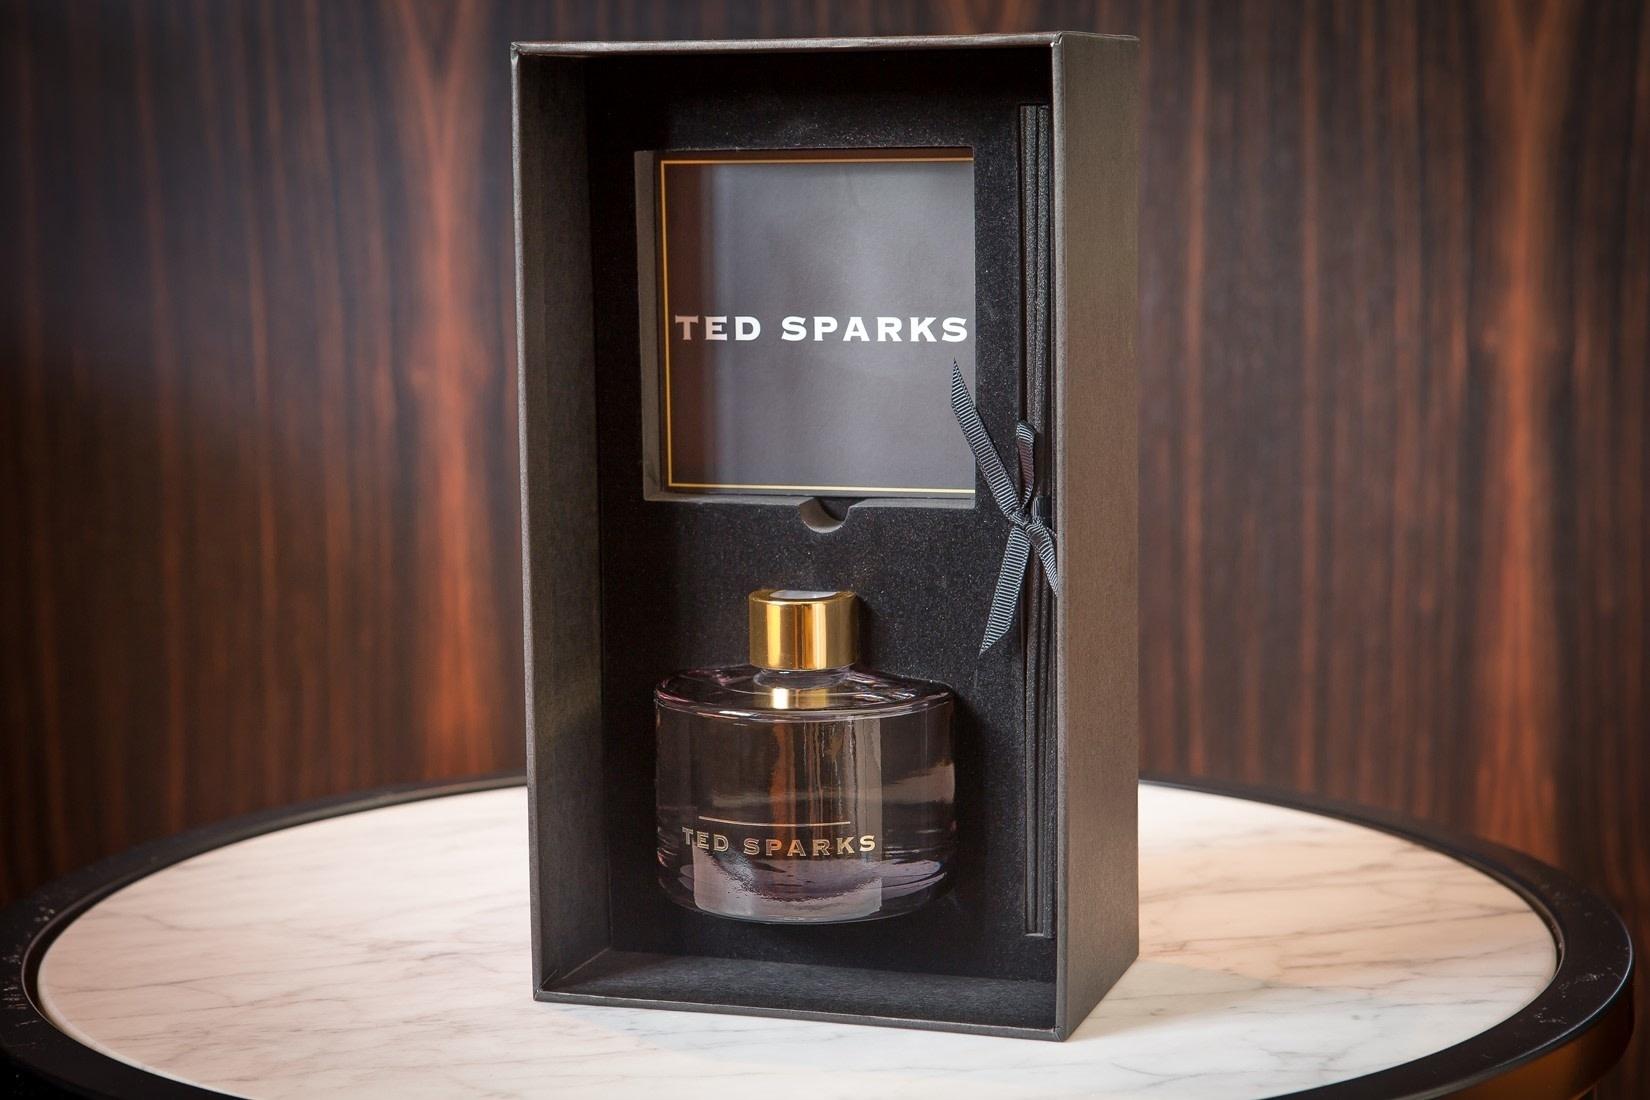 Ted Sparks White Tea & Chamomile Black Diffuser 200ml